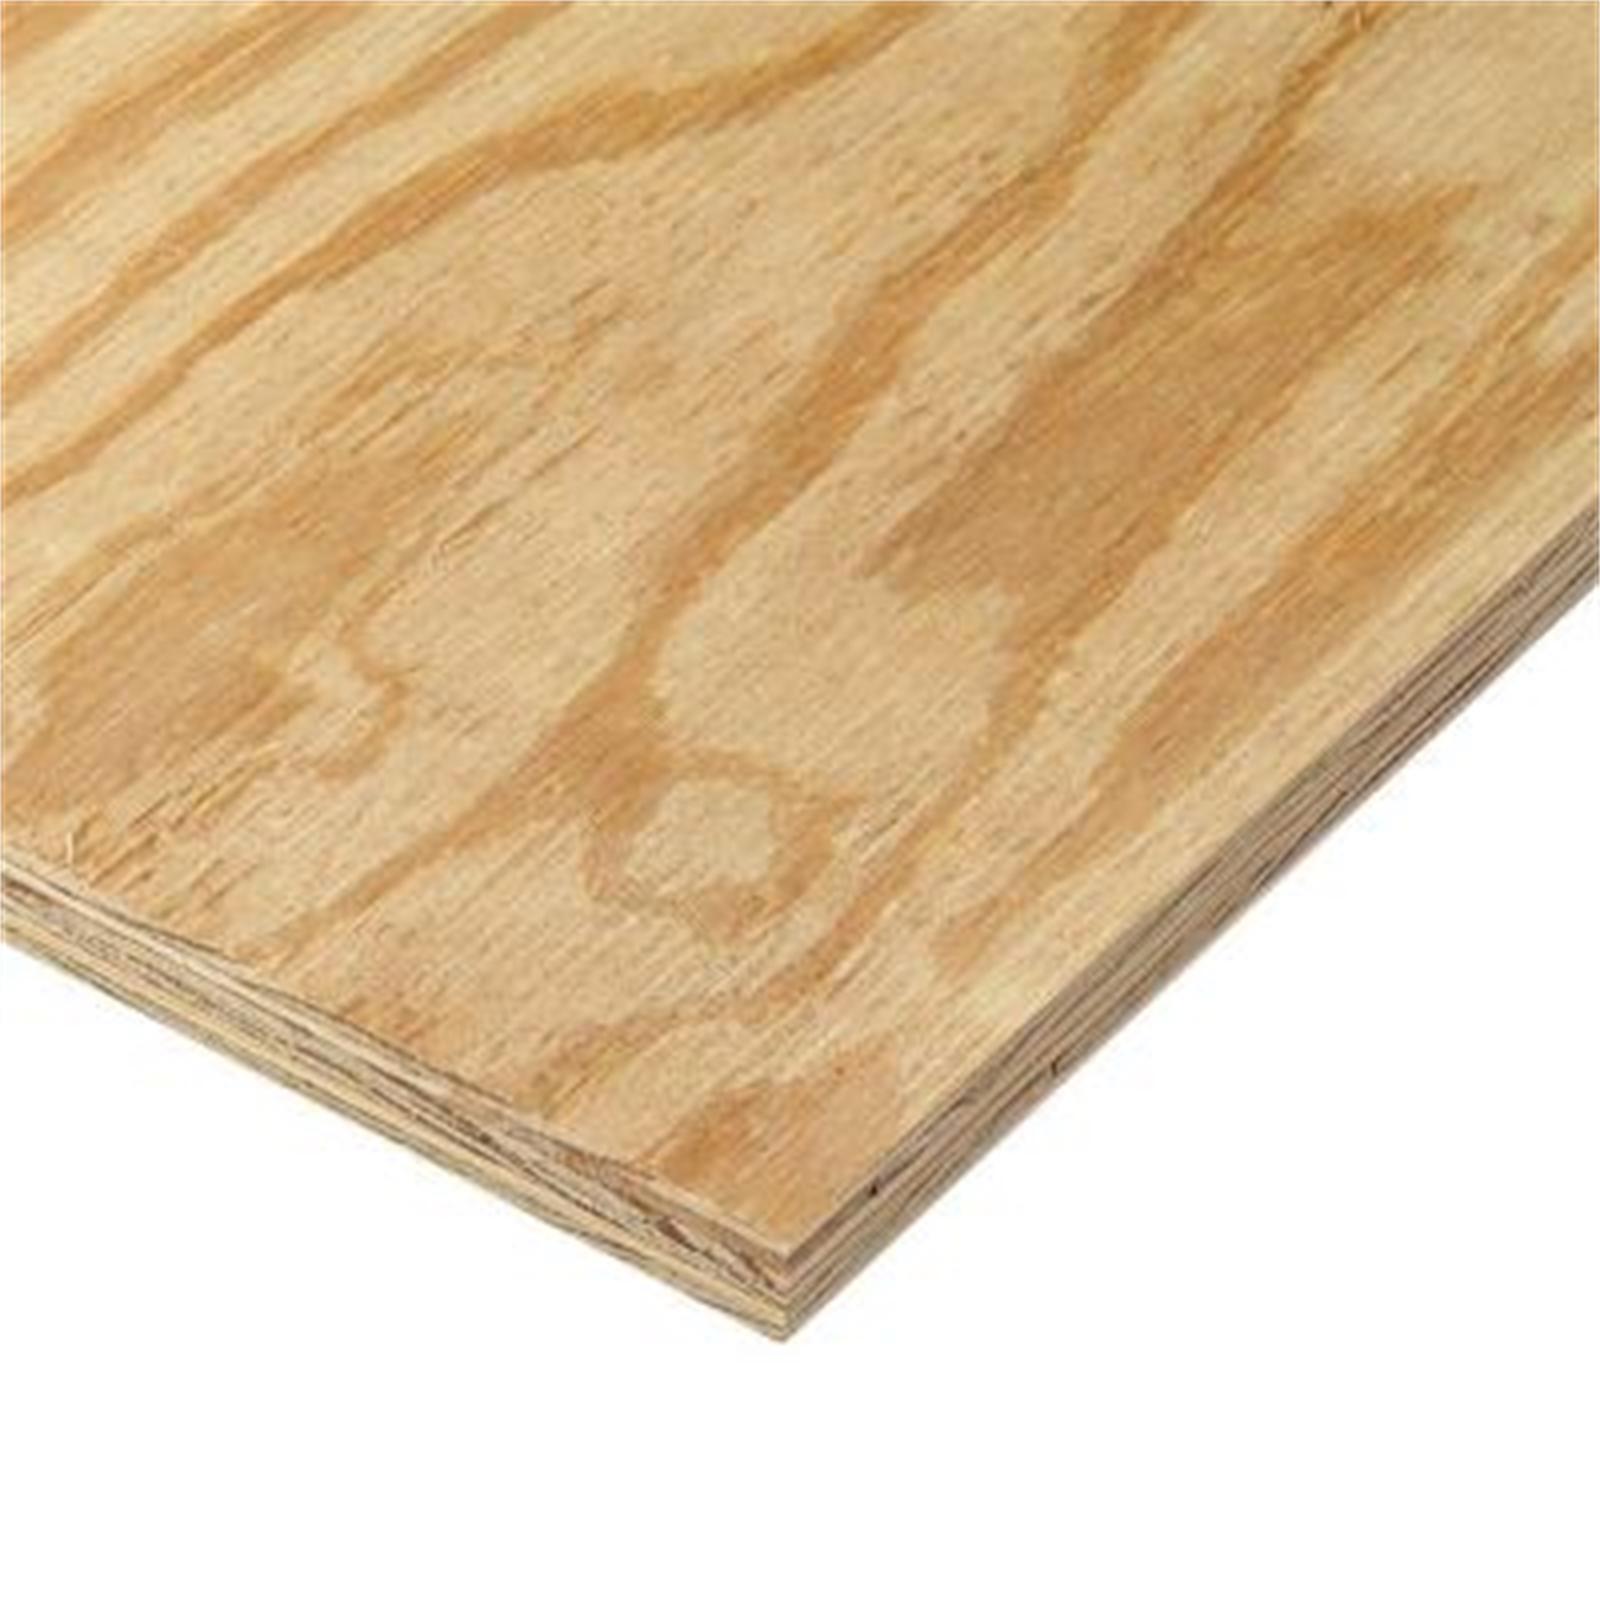 Project Panel 1220 x 2440mm 3mm Premium BC Plywood